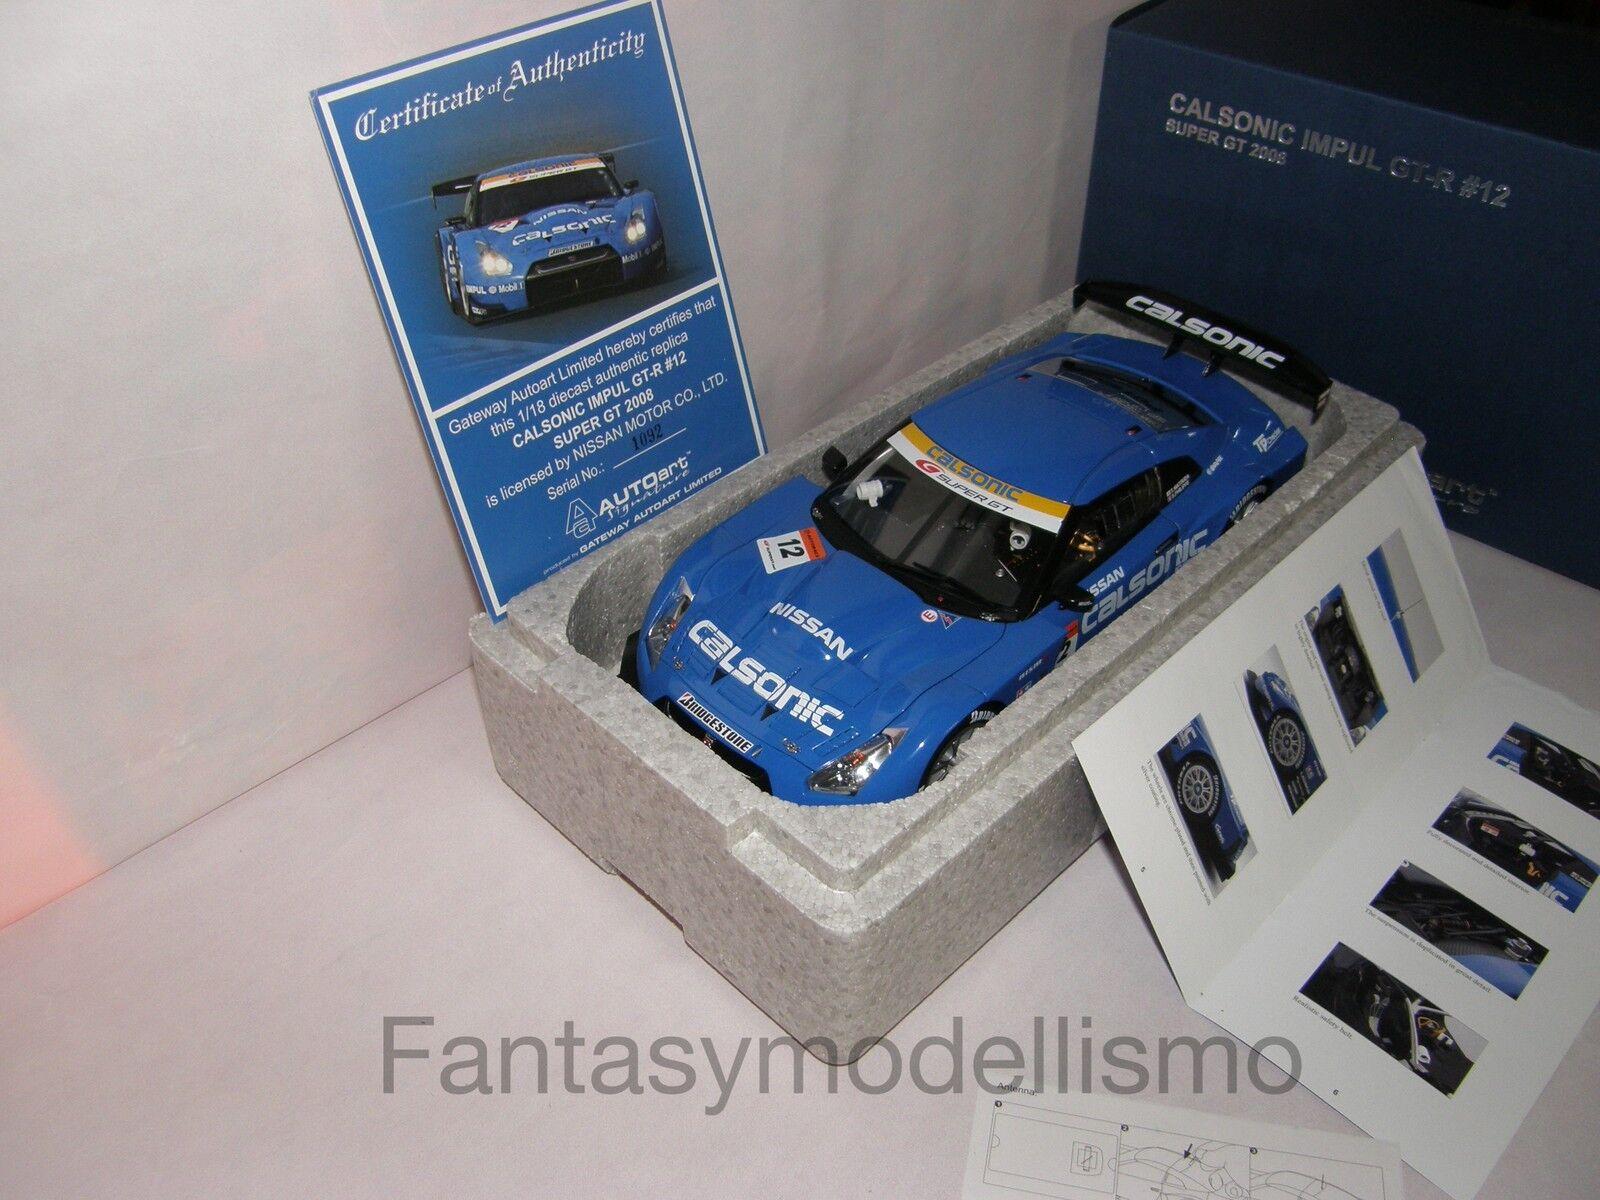 NISSAN CALSONIC IMPUL GT-R   12 SUPER 2008 AUTOart SCALA 1 18 ART 80877 AZZURRA  magasin en ligne de sortie